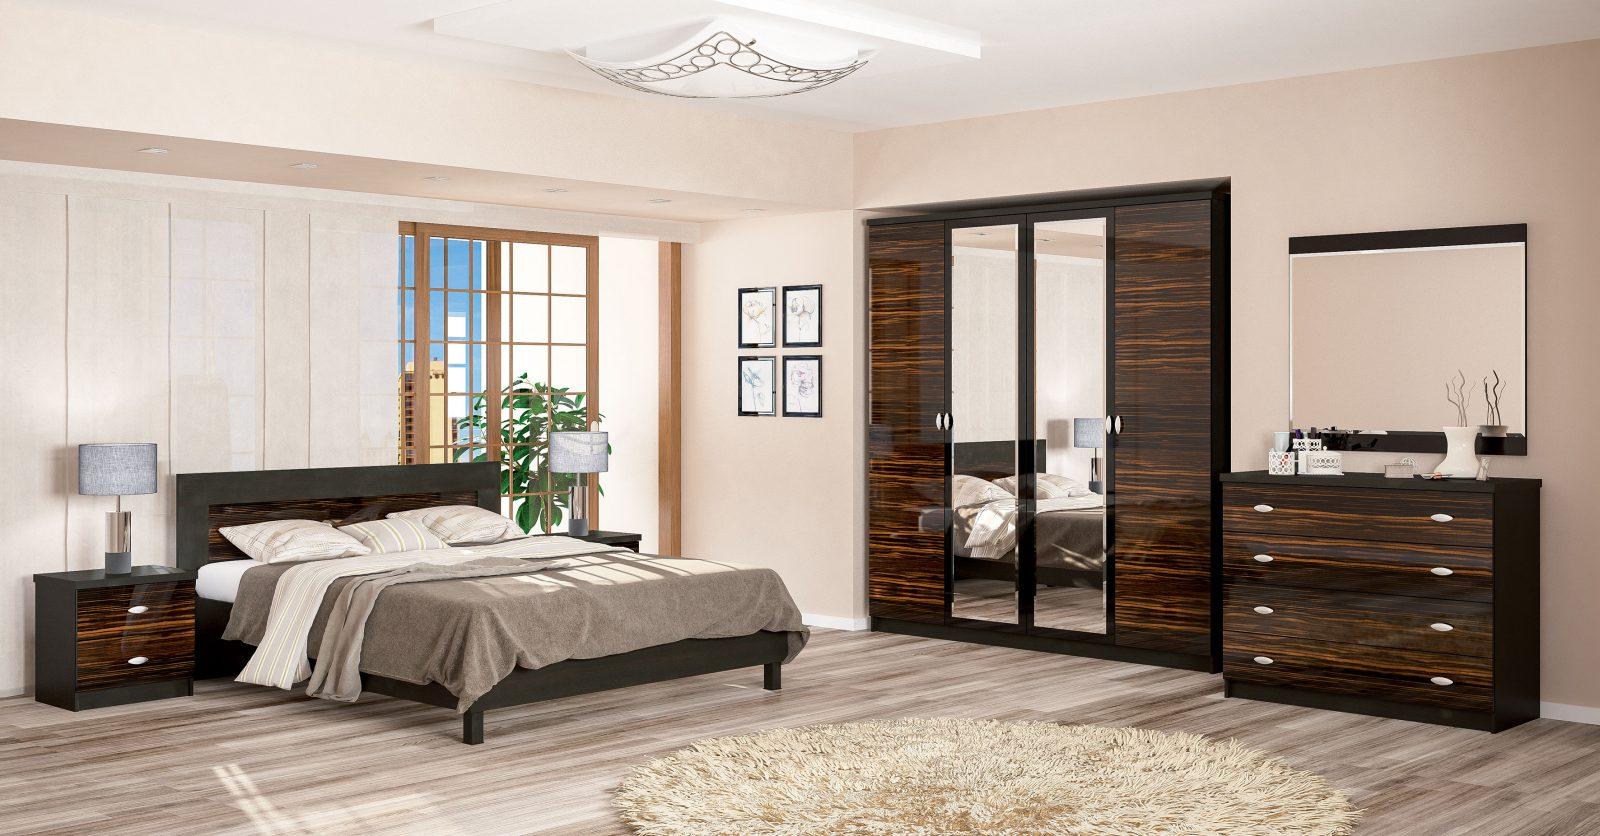 Спальня Ева Мебель Сервис макассар